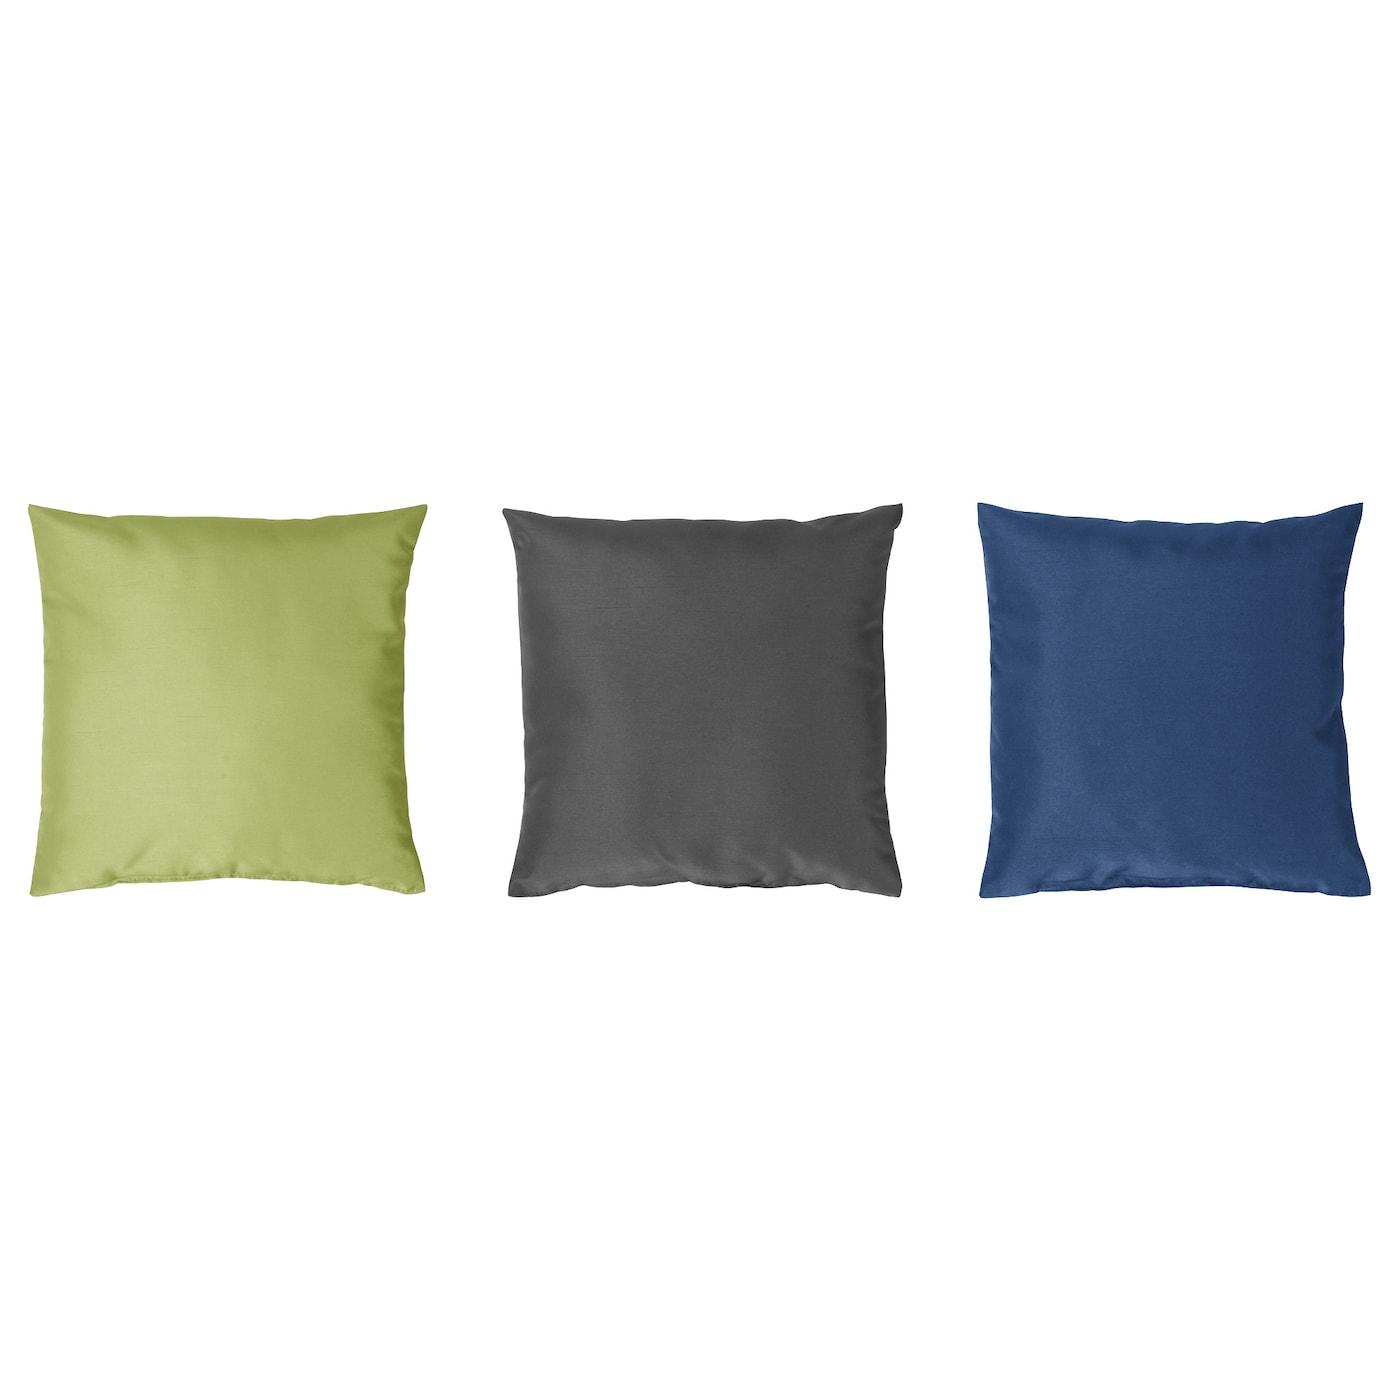 brittlis coussin coloris assortis ikea. Black Bedroom Furniture Sets. Home Design Ideas